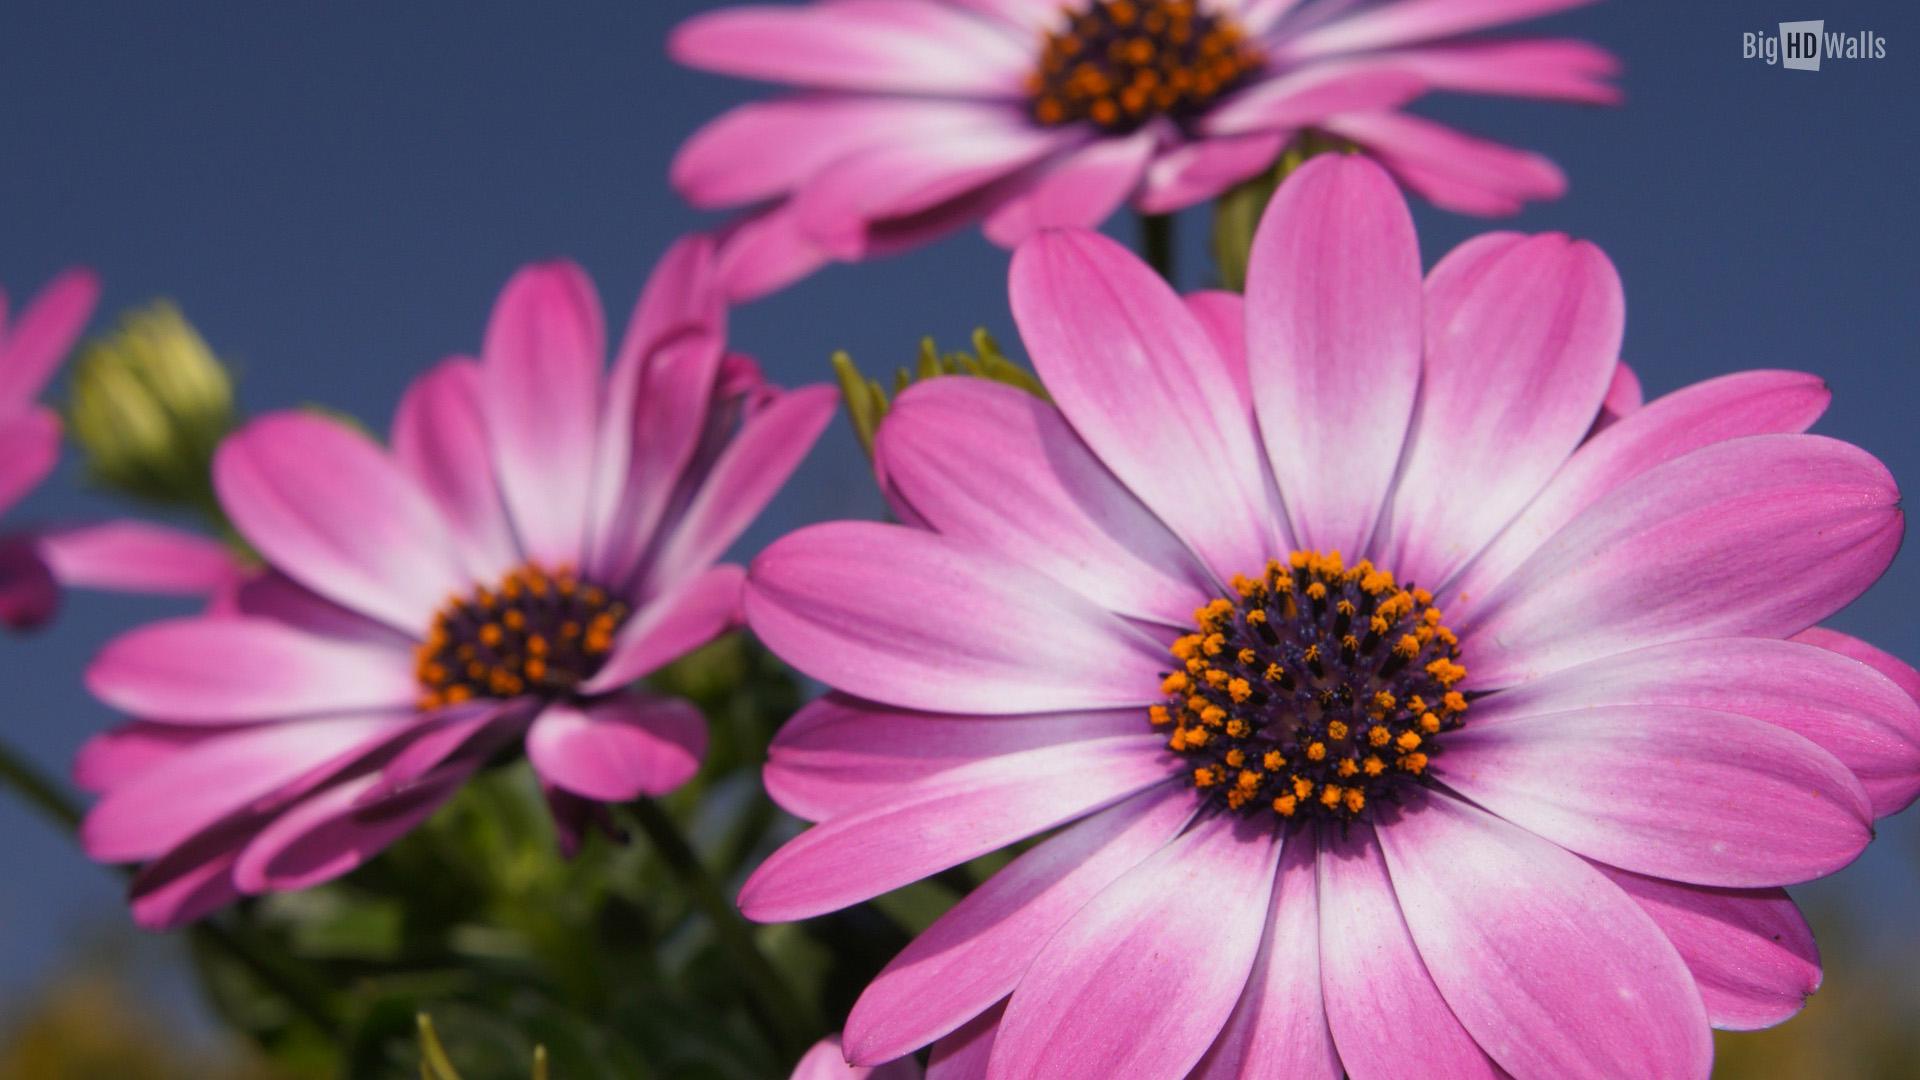 10 spring Flowers HD Wallpapers BigHDWalls 1920x1080